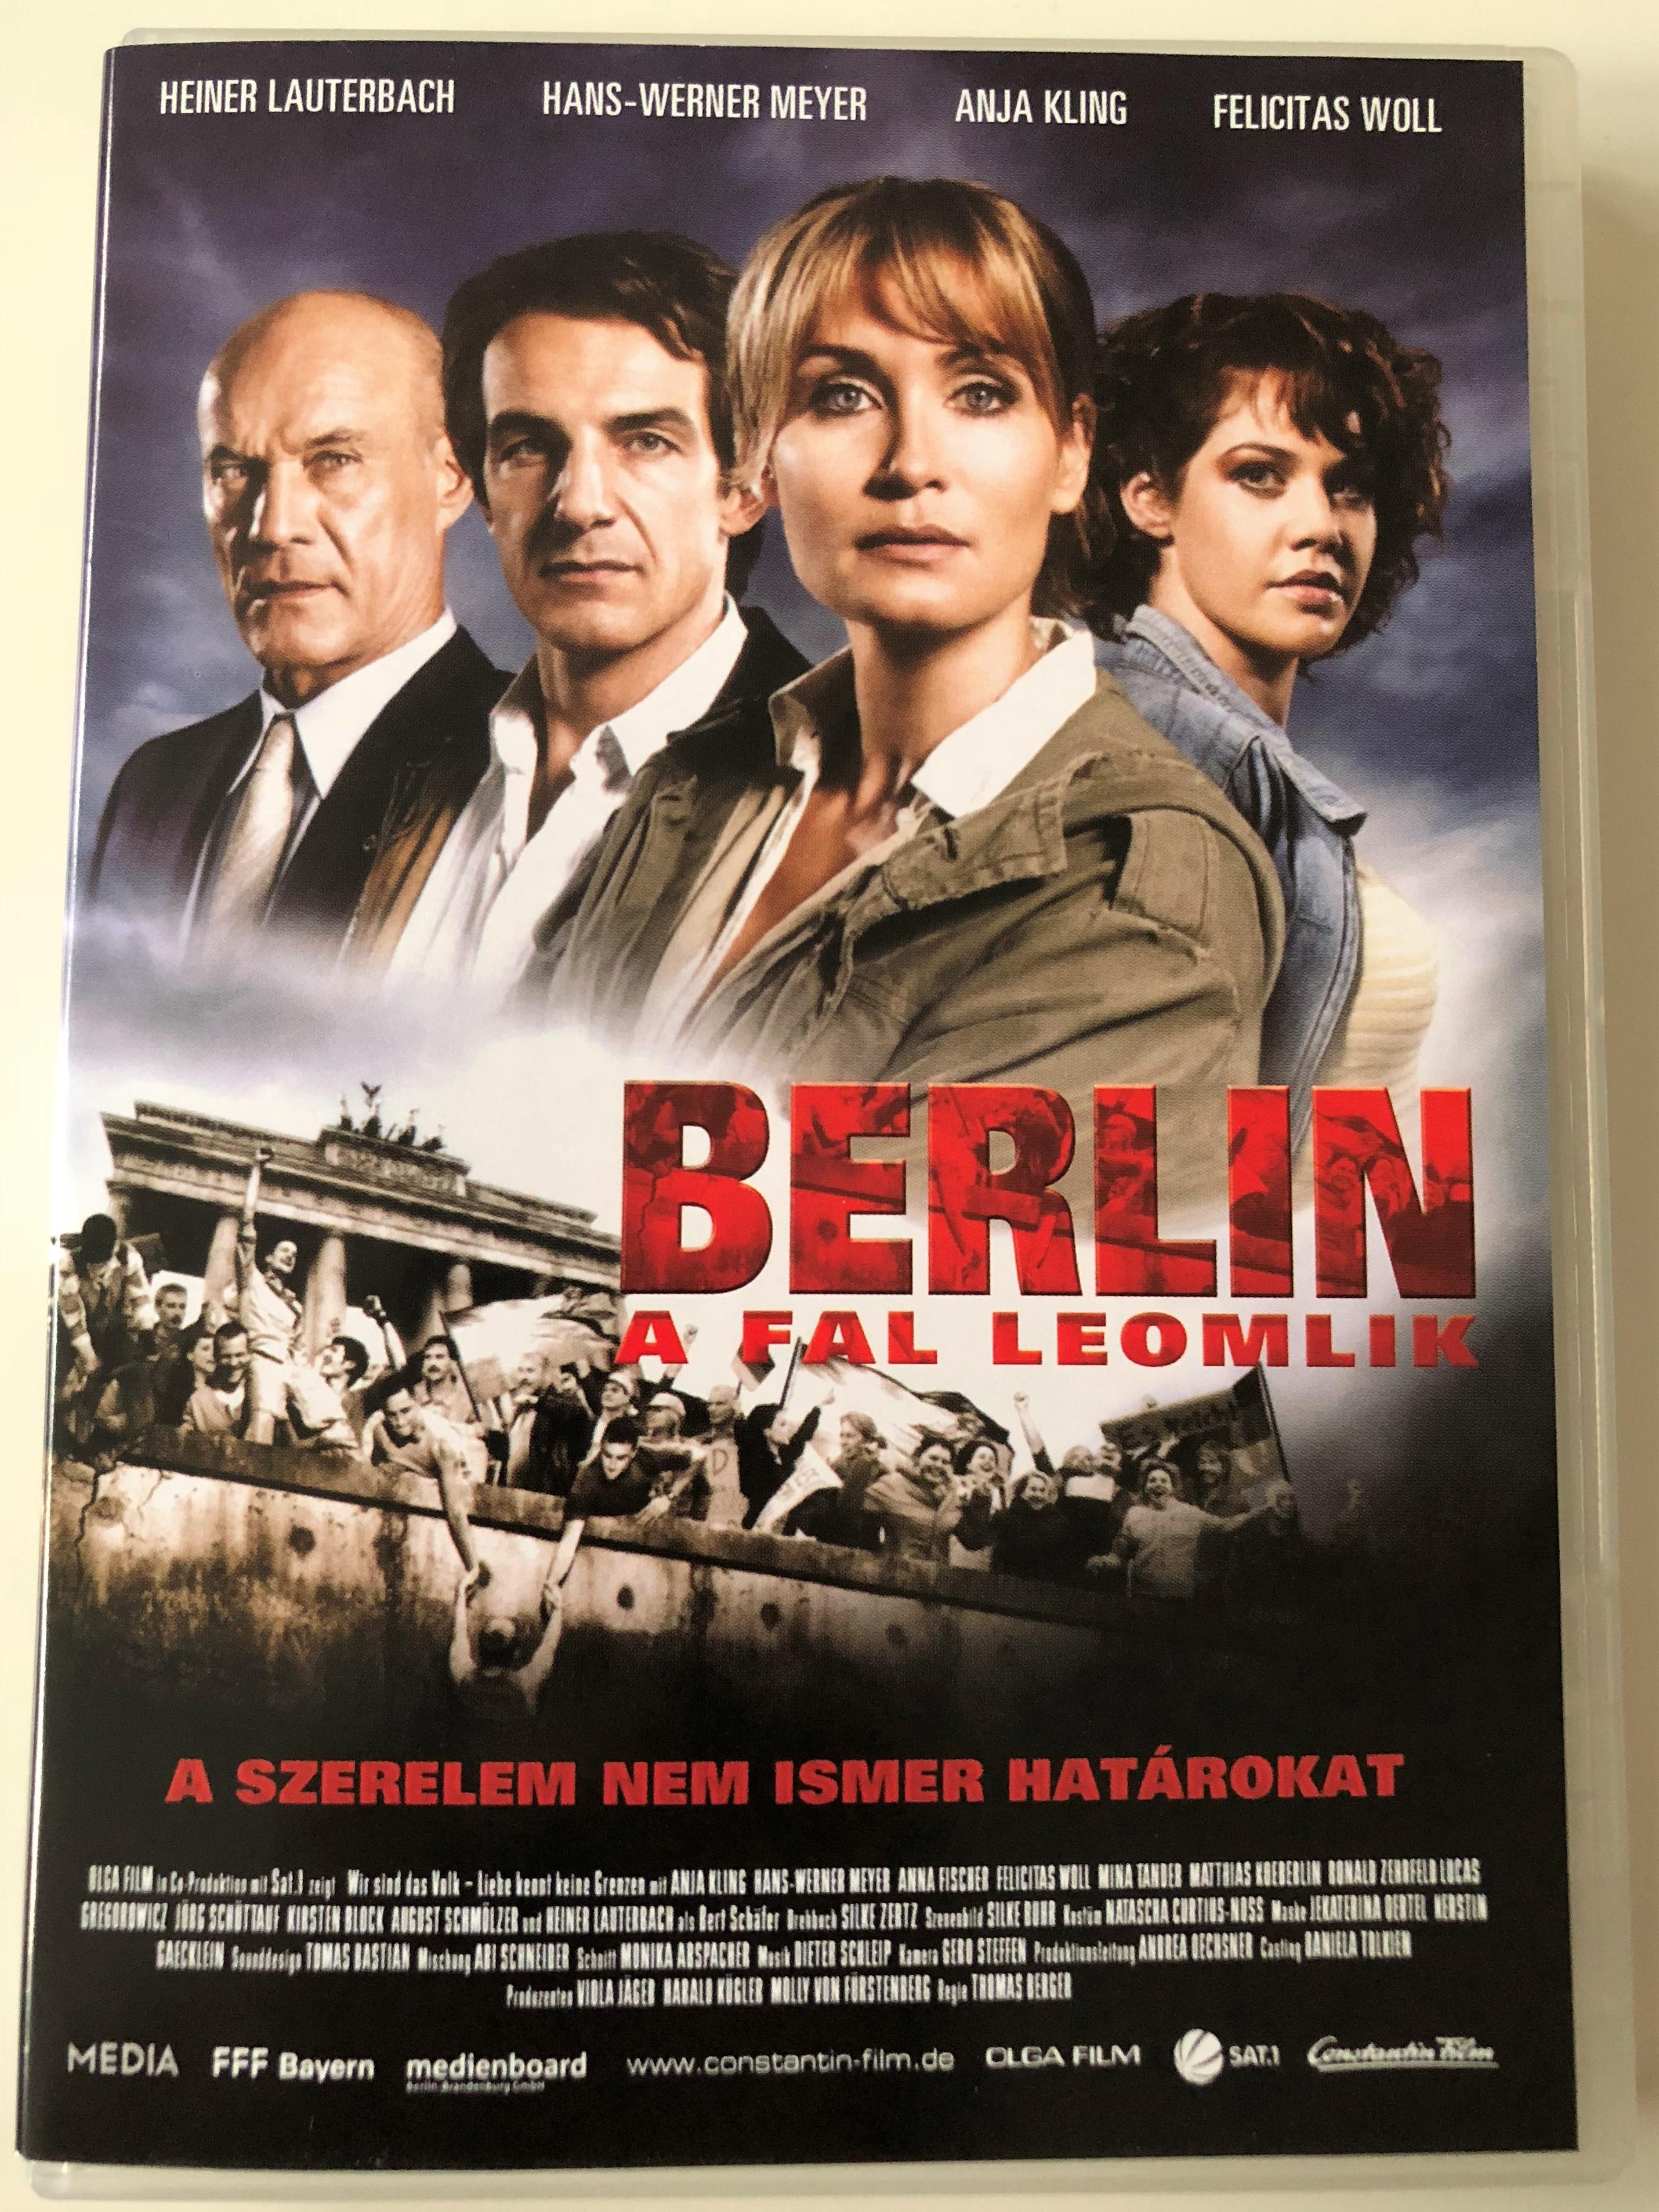 berlin-a-fal-leomlik-dvd-2008-wir-sind-das-volk-the-final-days-directed-by-thomas-berger-starring-heiner-lauterbach-hans-werner-meyer-anja-kling-felicitas-woll-1-.jpg